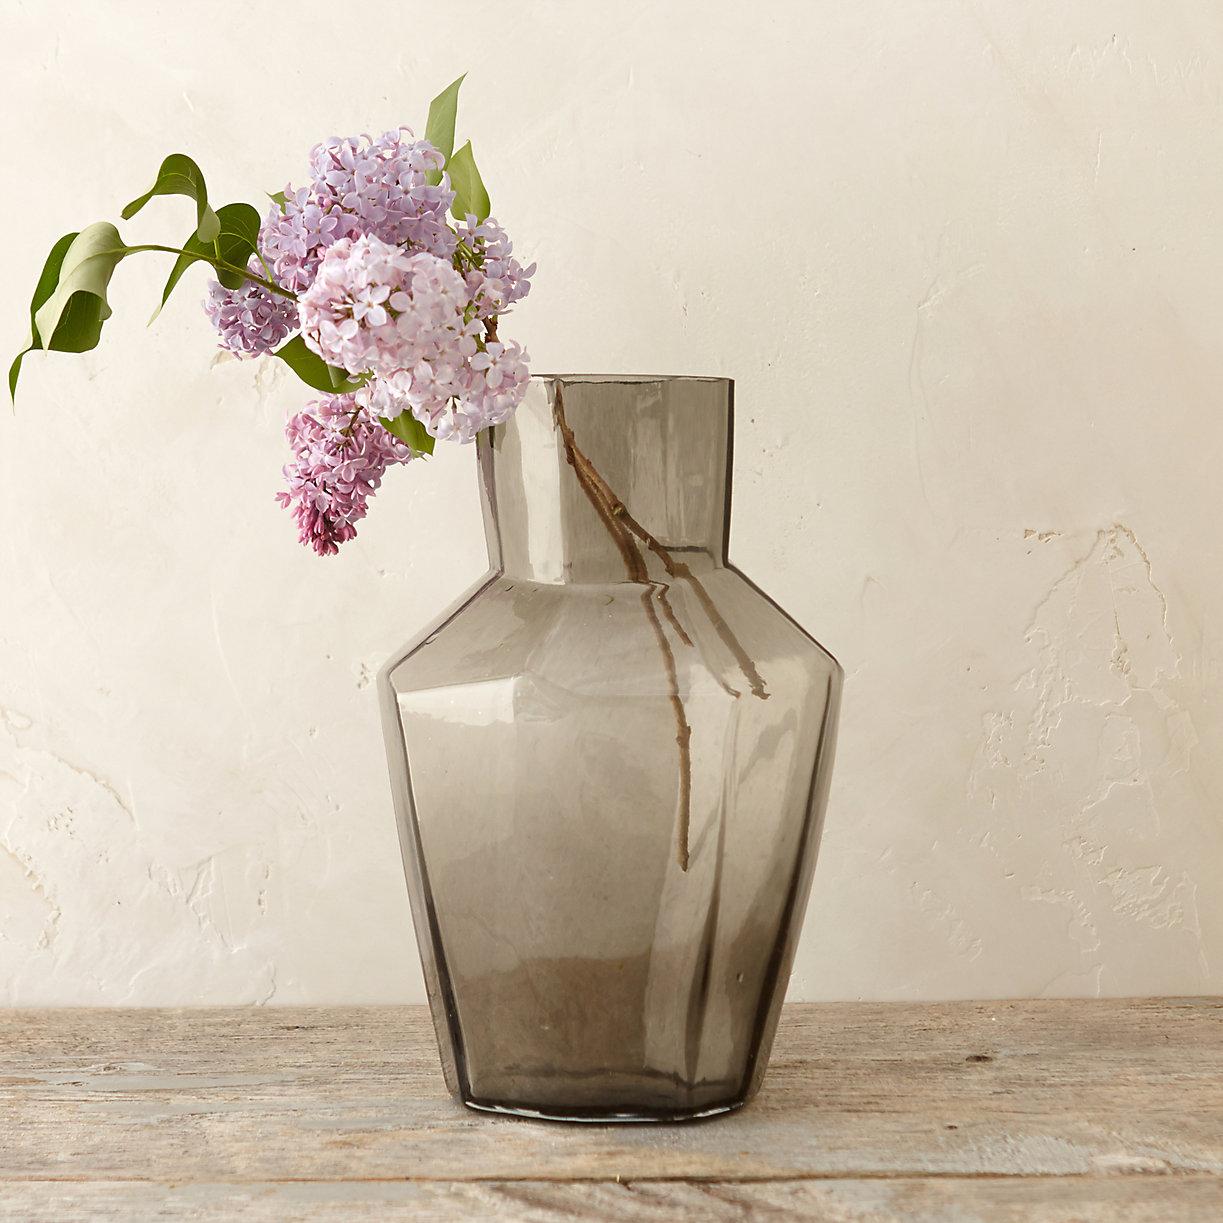 Smoky geometric vase from Terrain